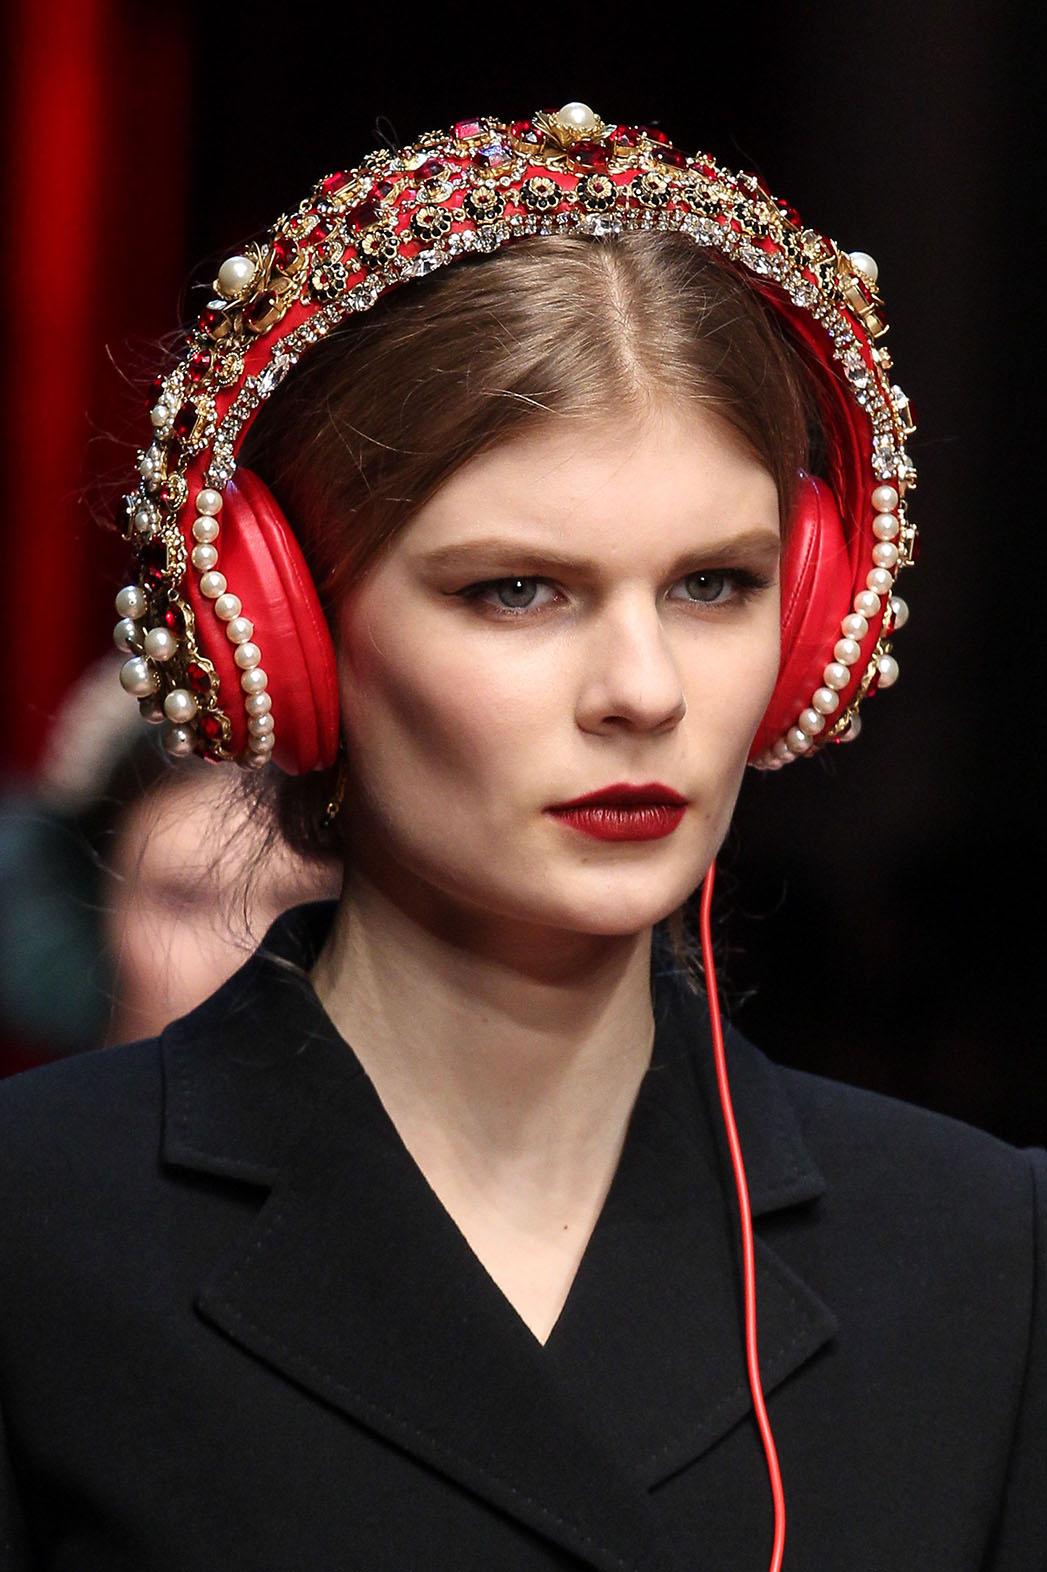 dolce & gabbana headphones - P 2015